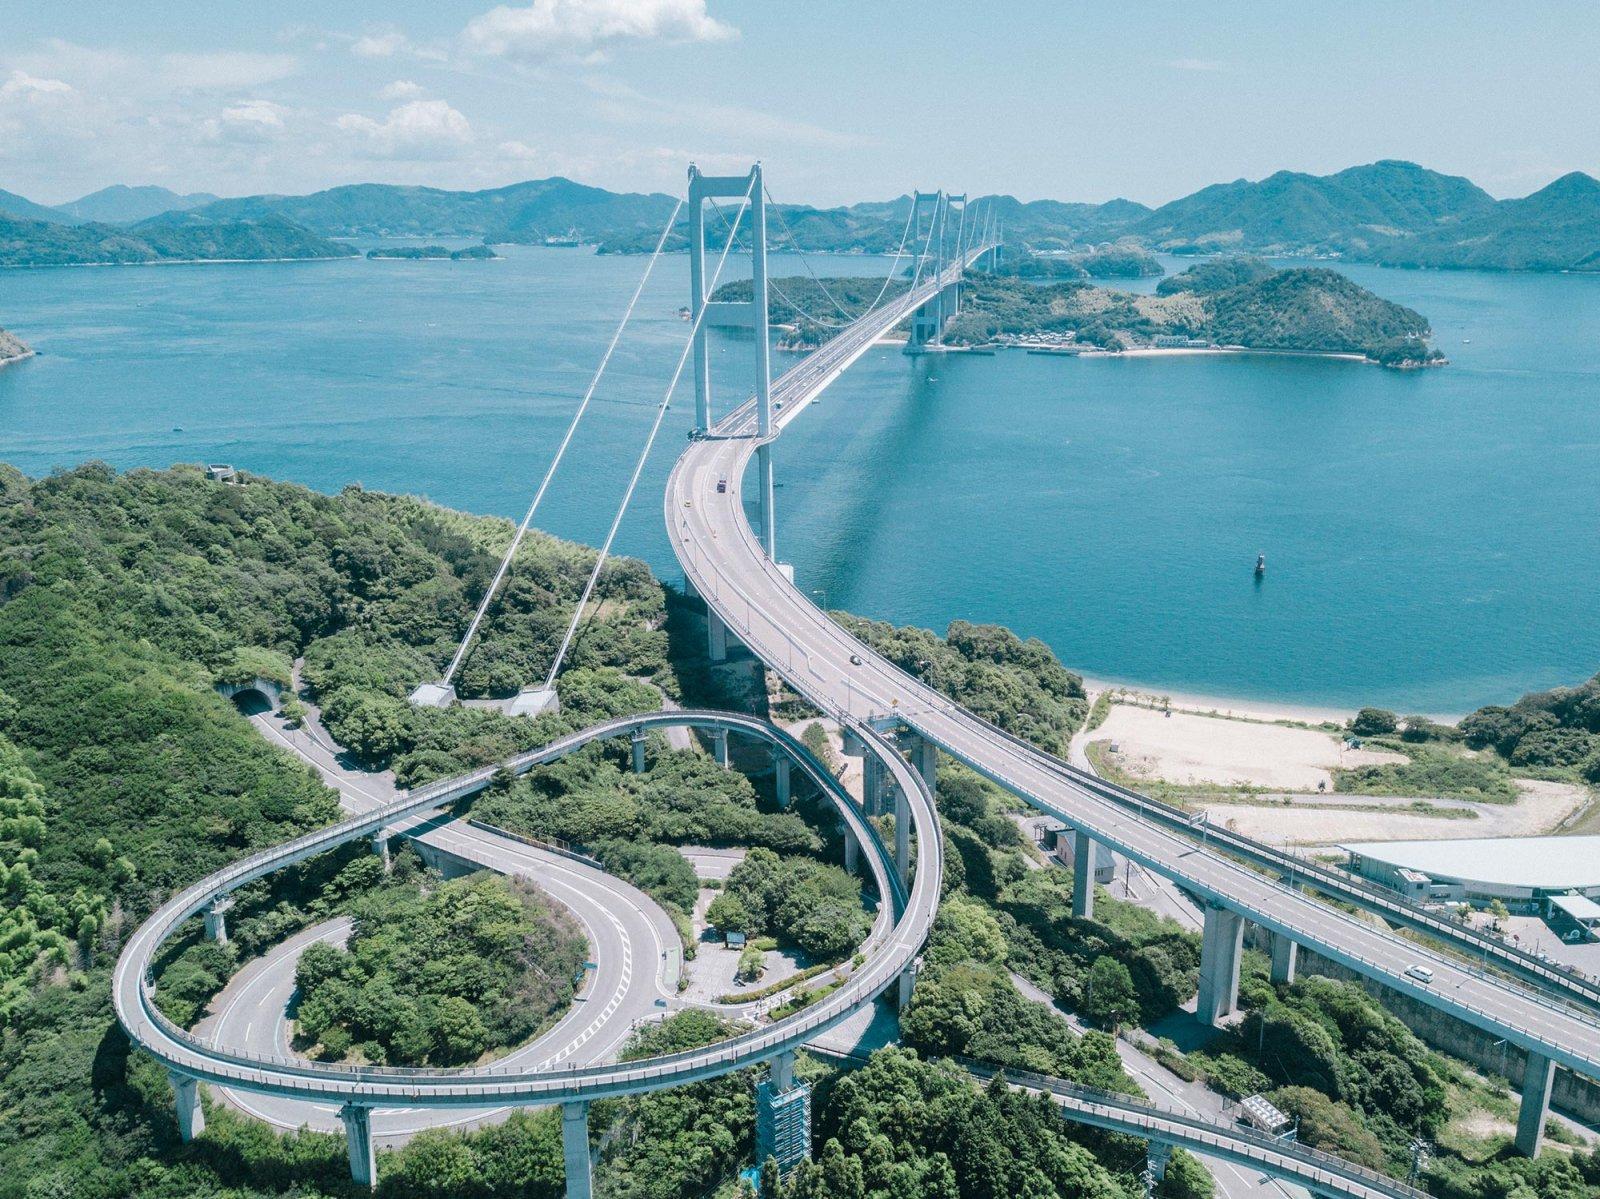 Shimanami Kaido - Oshima and Hakata Island Loop -